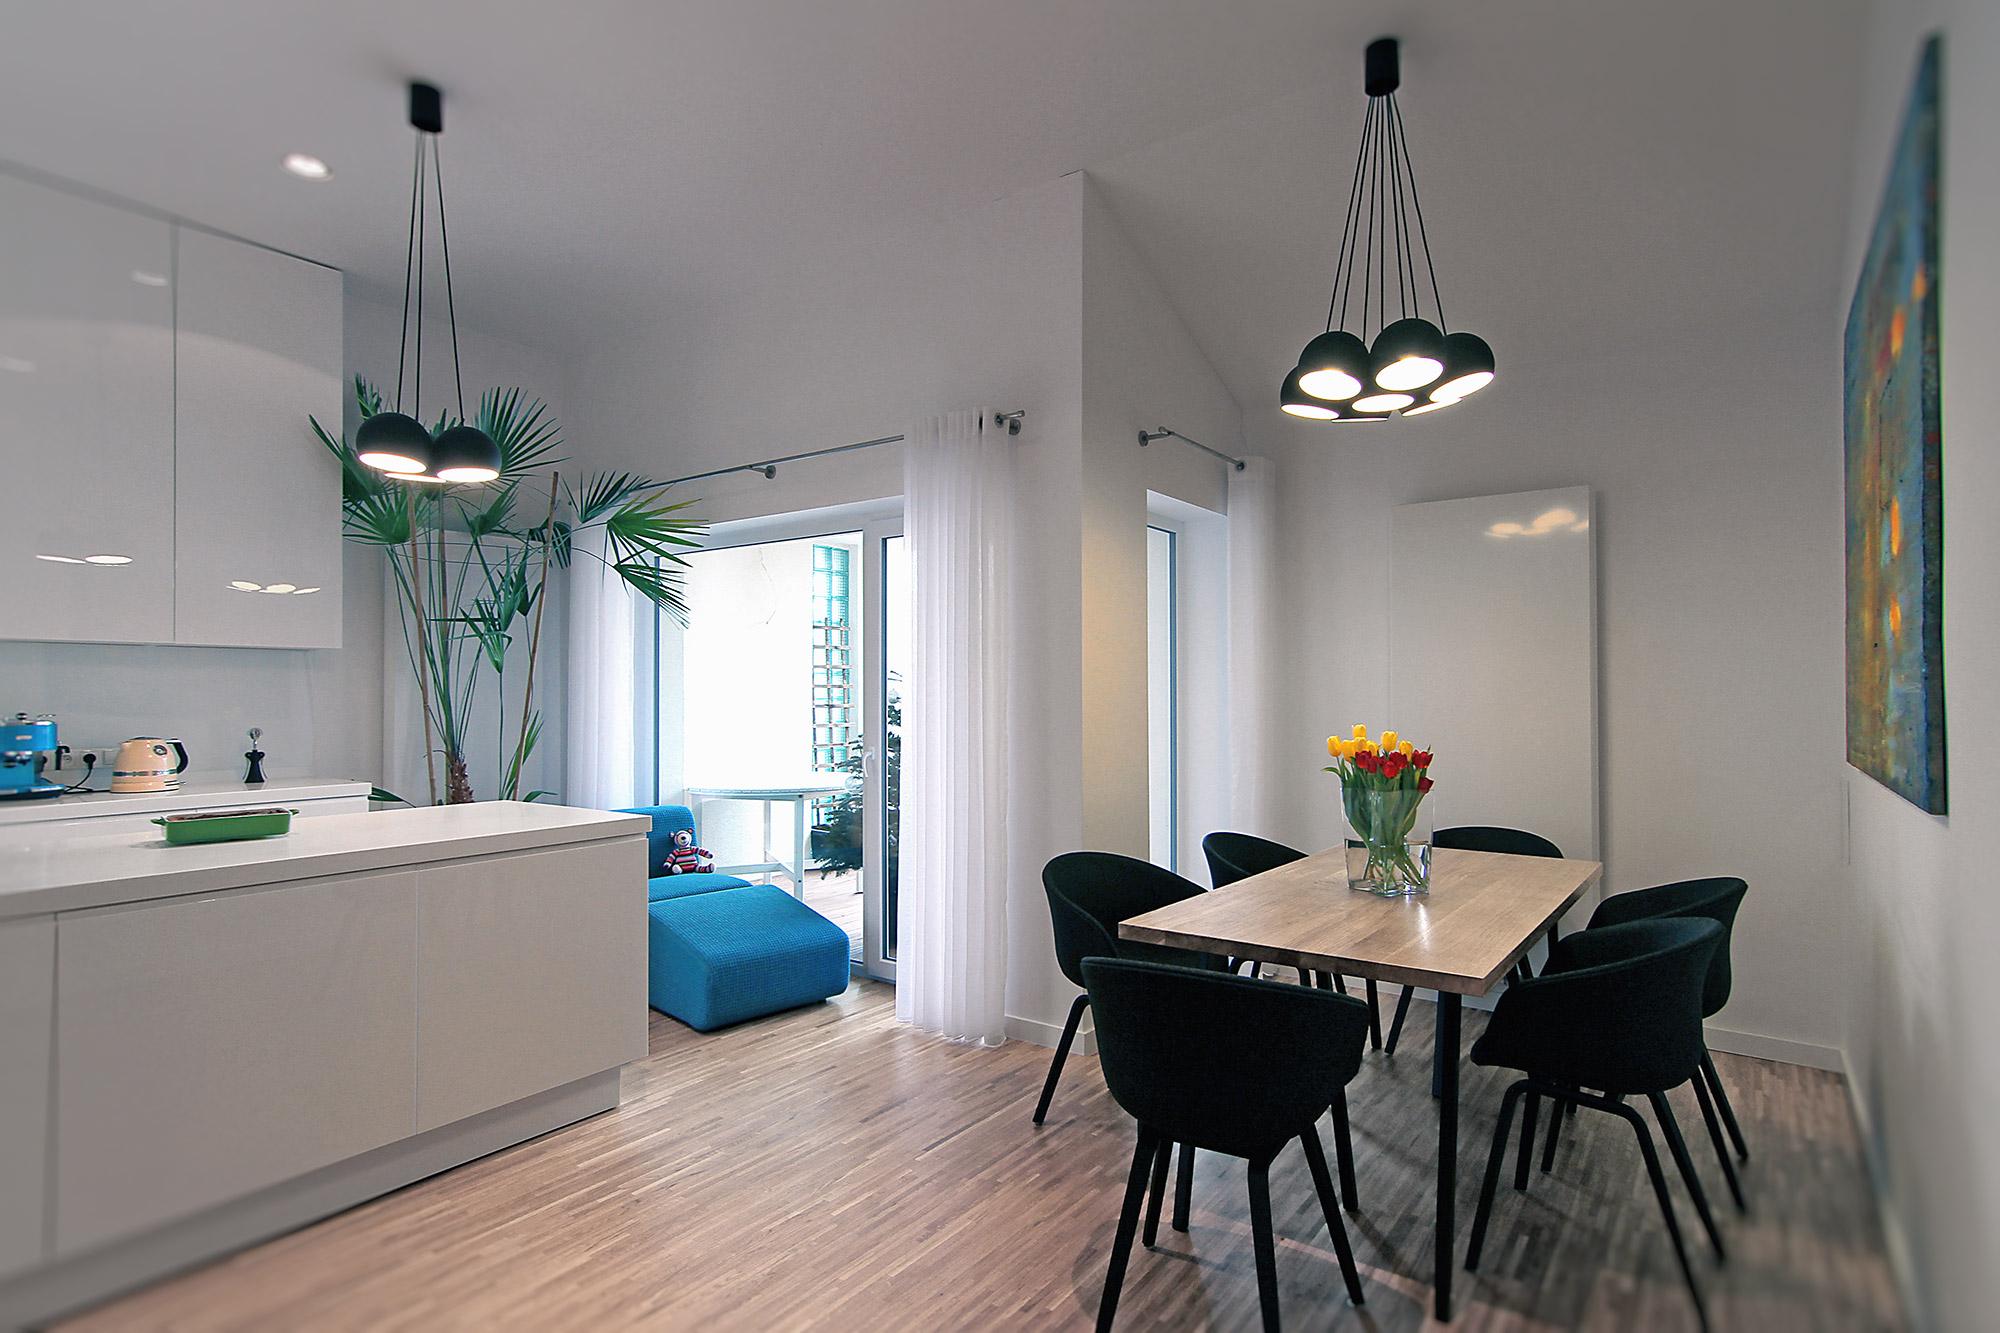 Rozany potok house interiors neostudio architekci archello